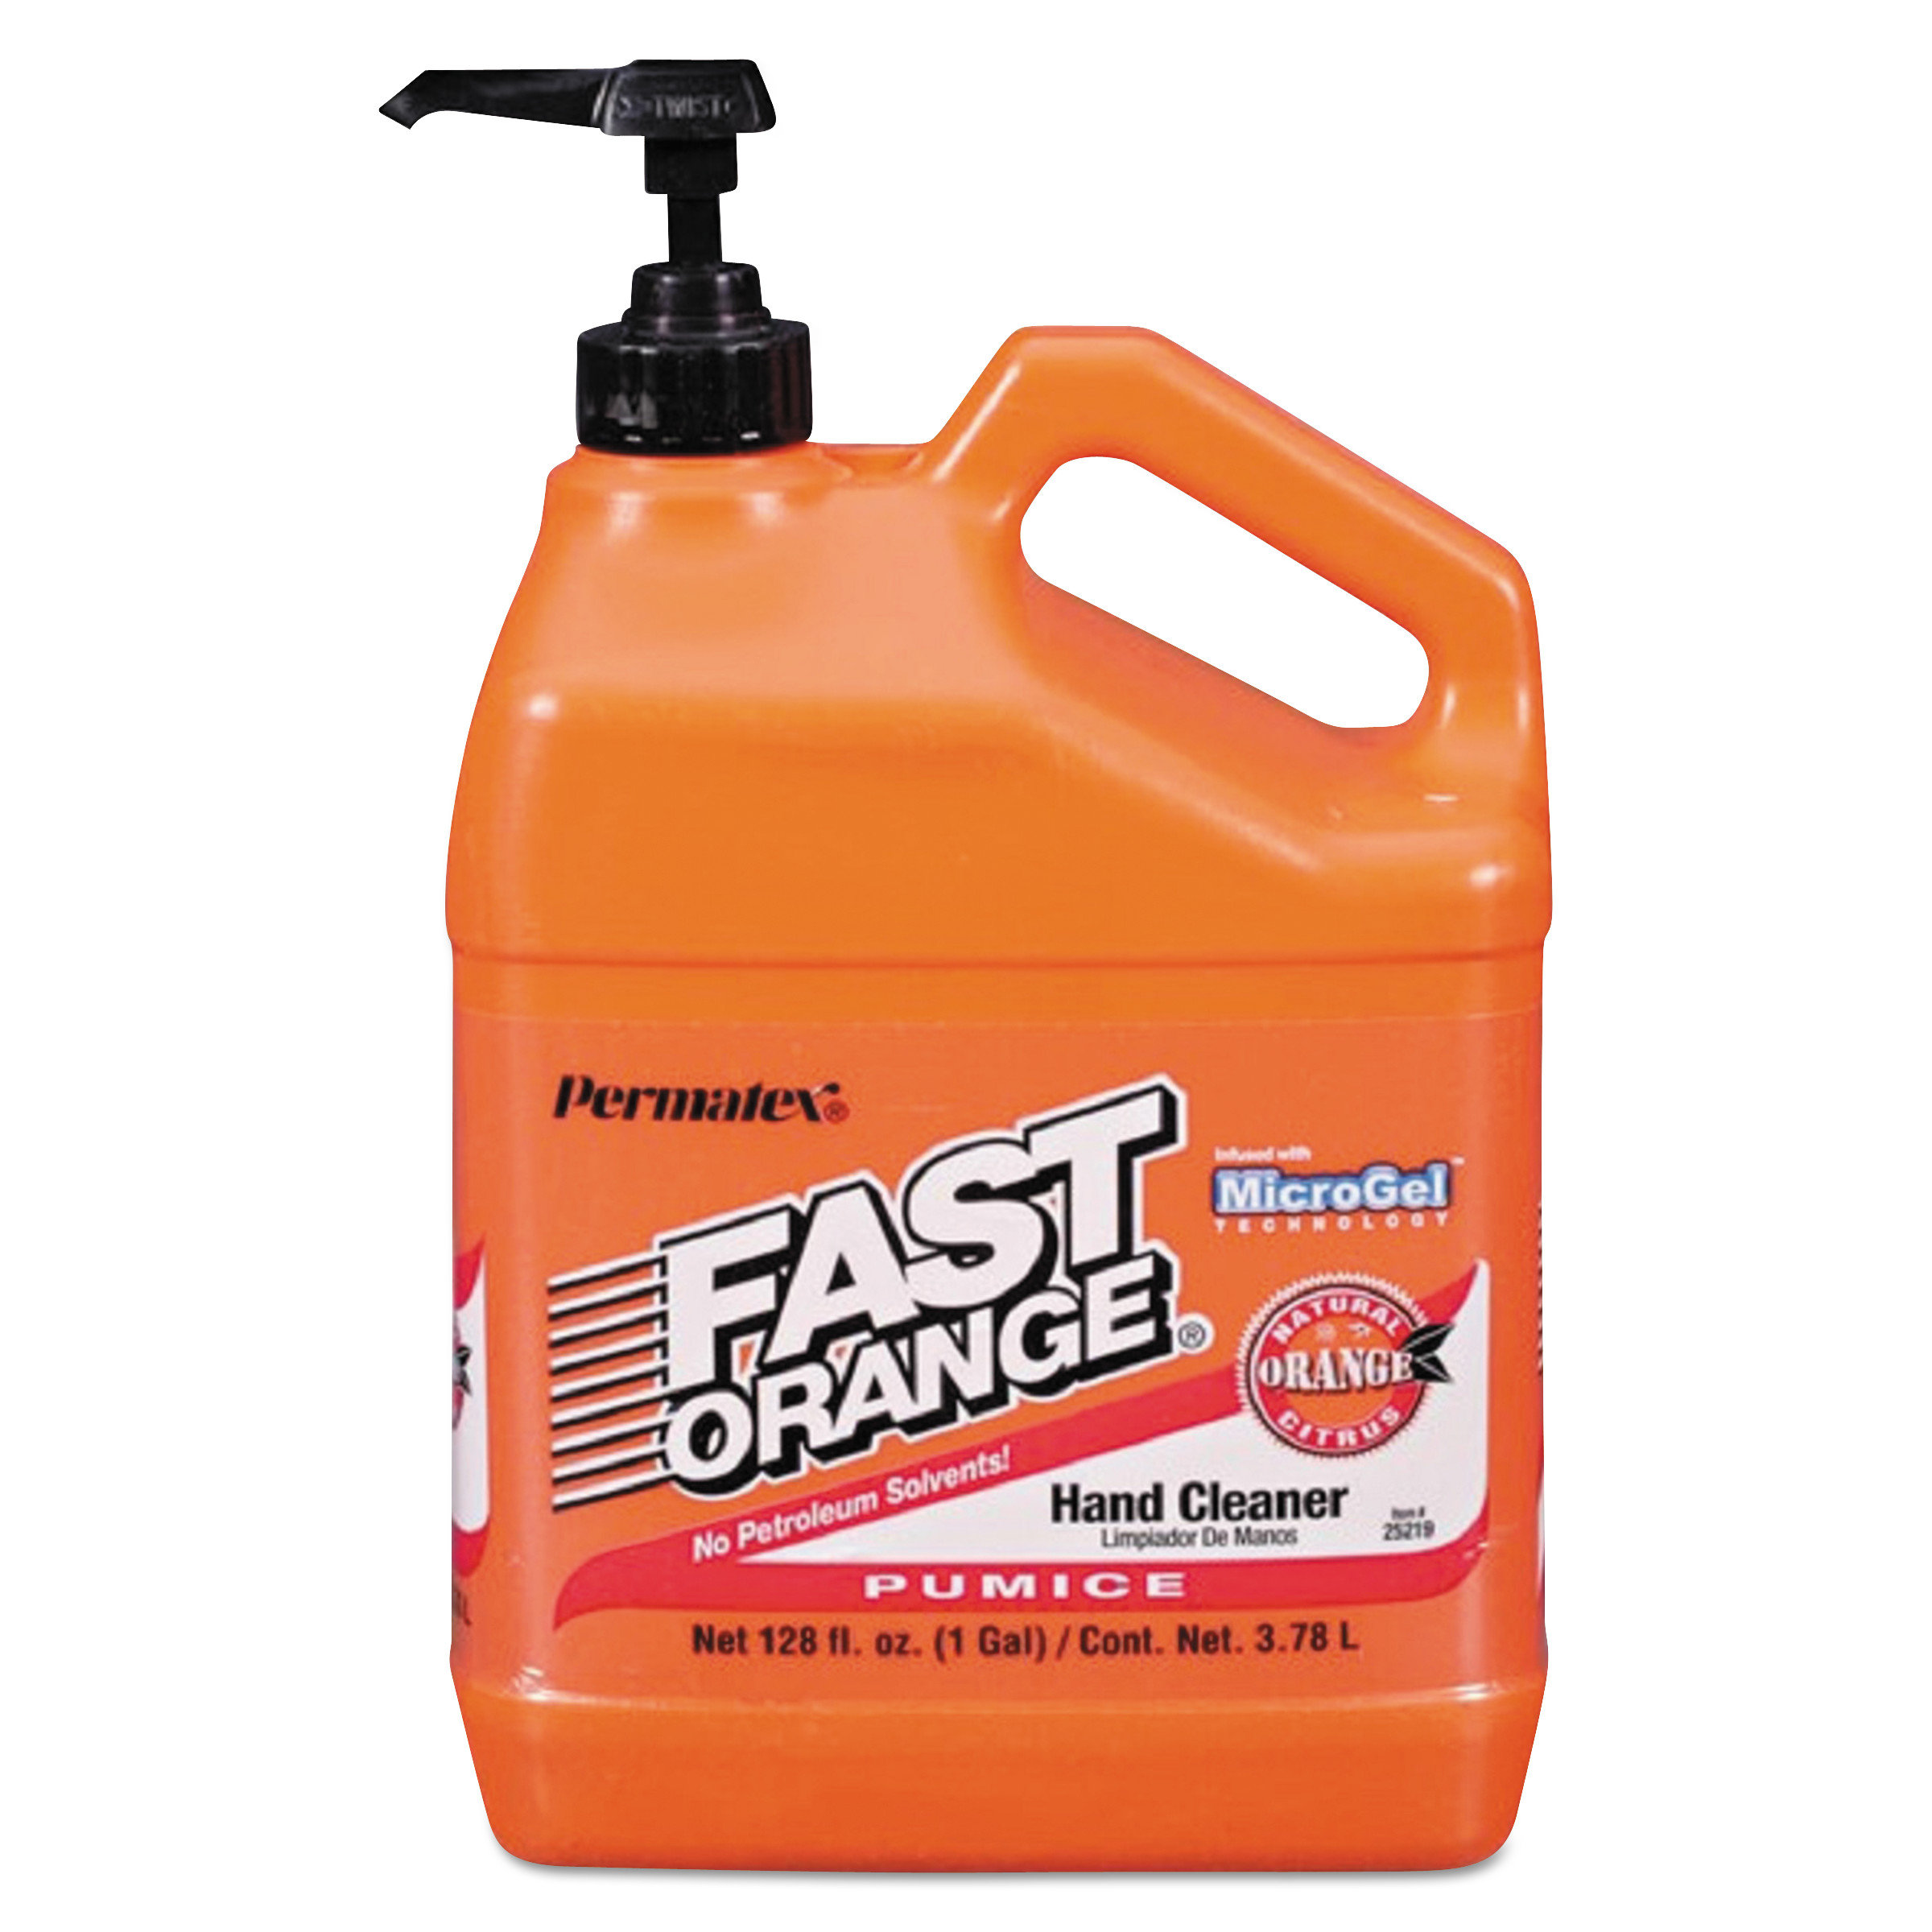 Permatex 1 Gallon Fast Orange Pumice Lotion Hand Cleaner  25